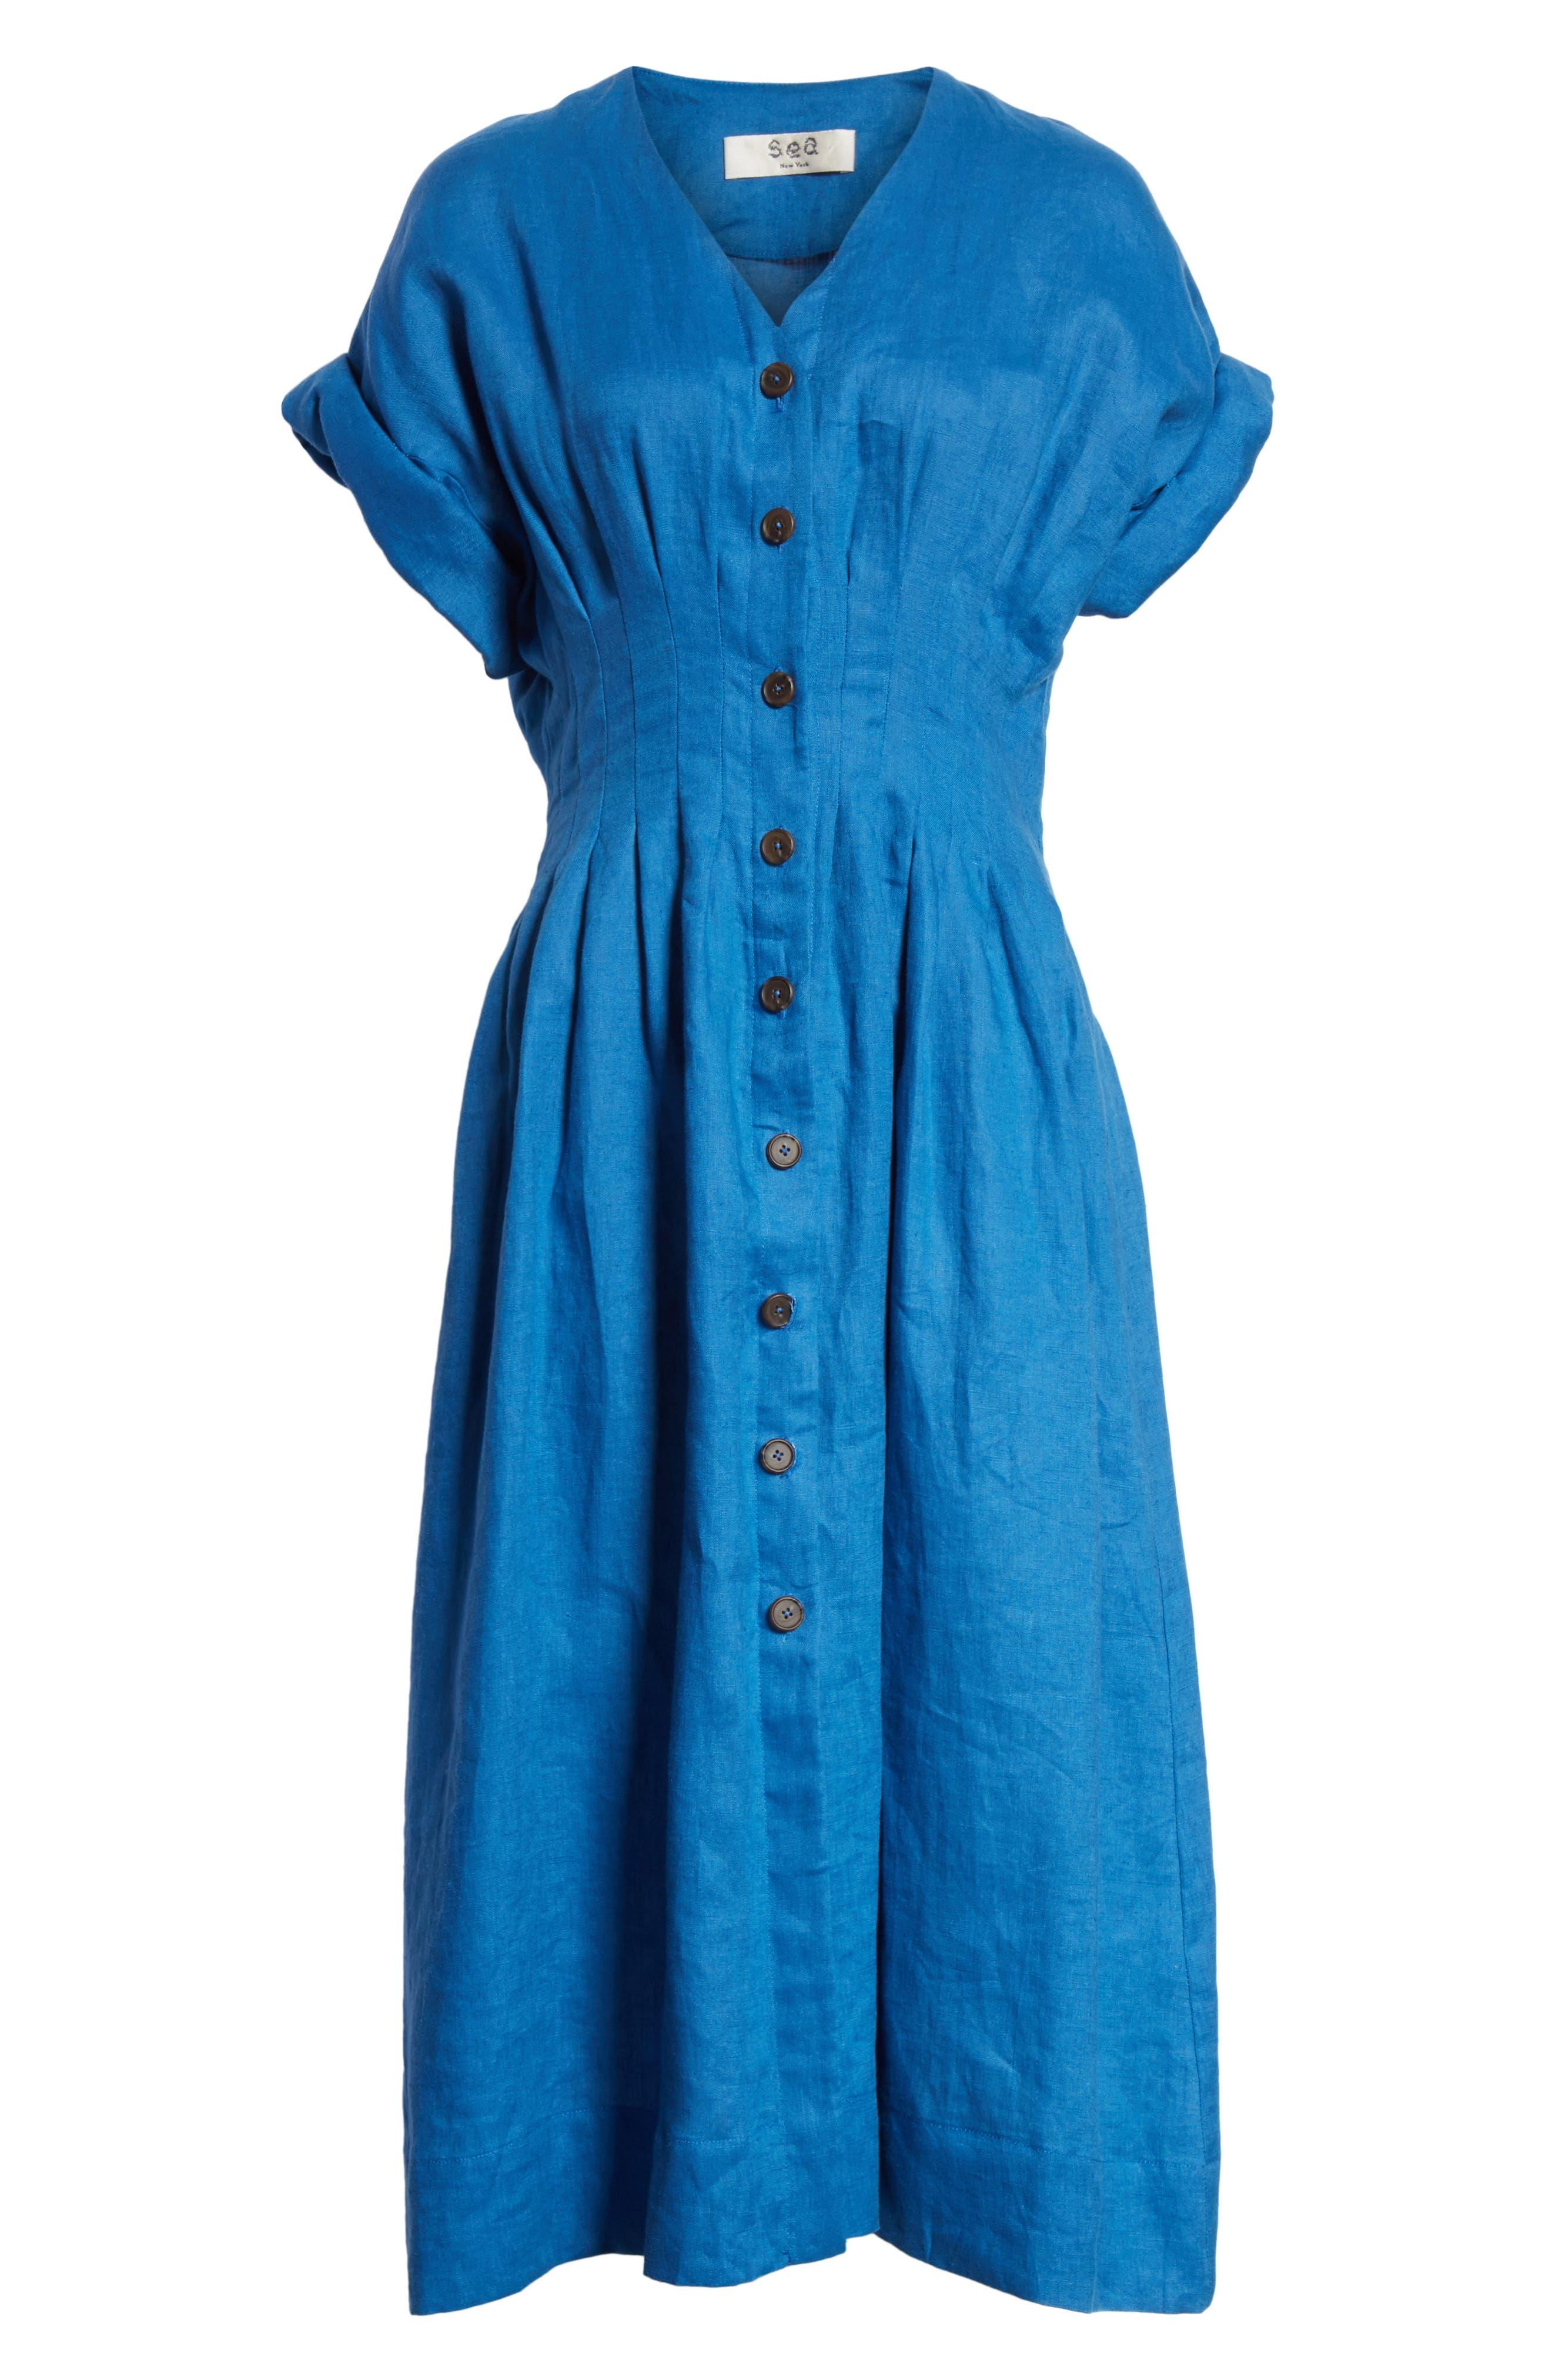 Coraline Pleated Button Front Linen Dress,                             Alternate thumbnail 6, color,                             400